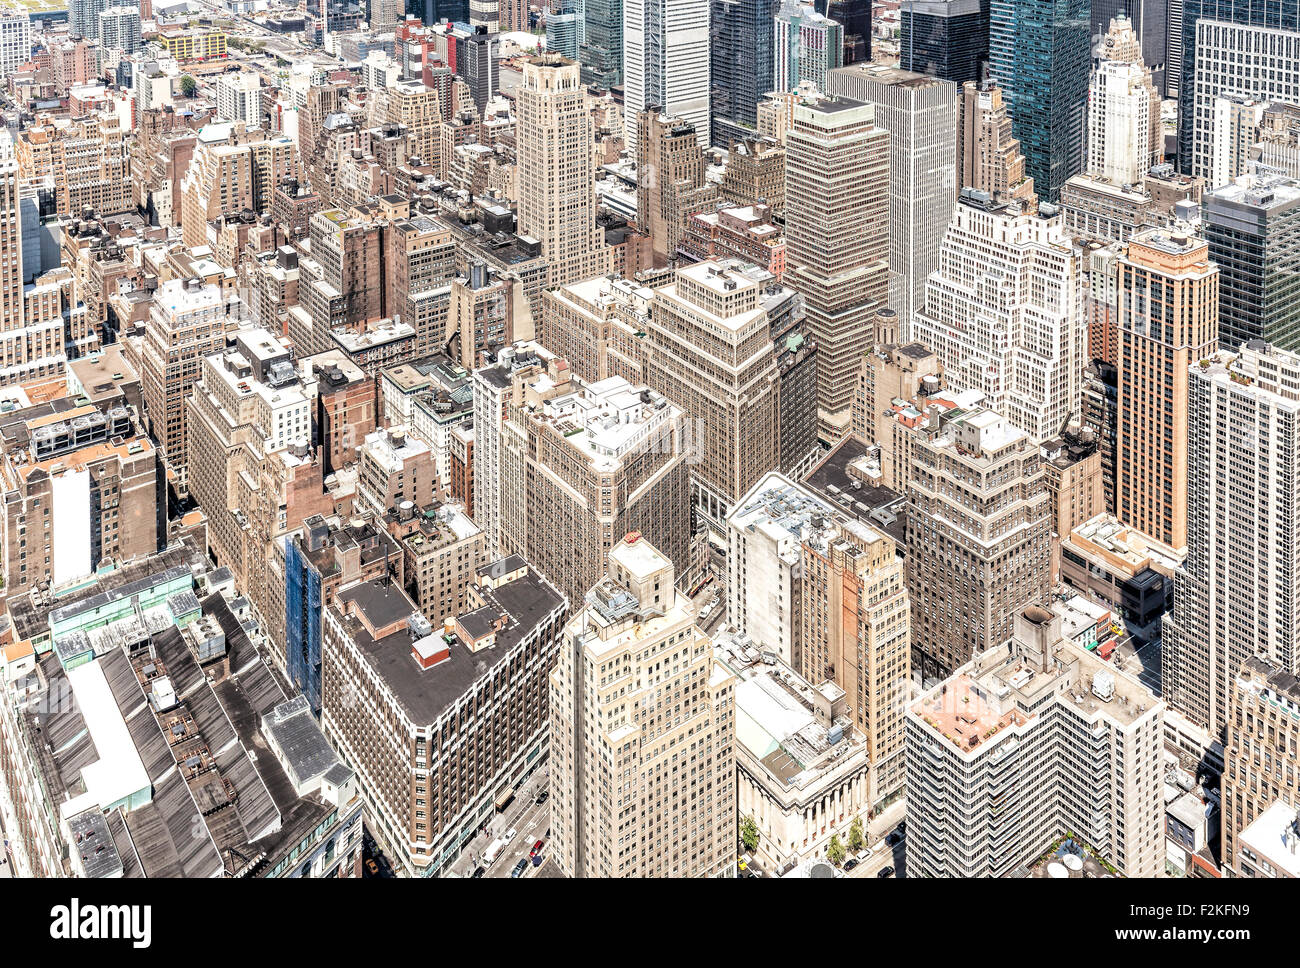 Vue aérienne du centre-ville de Manhattan, New York, USA. Photo Stock